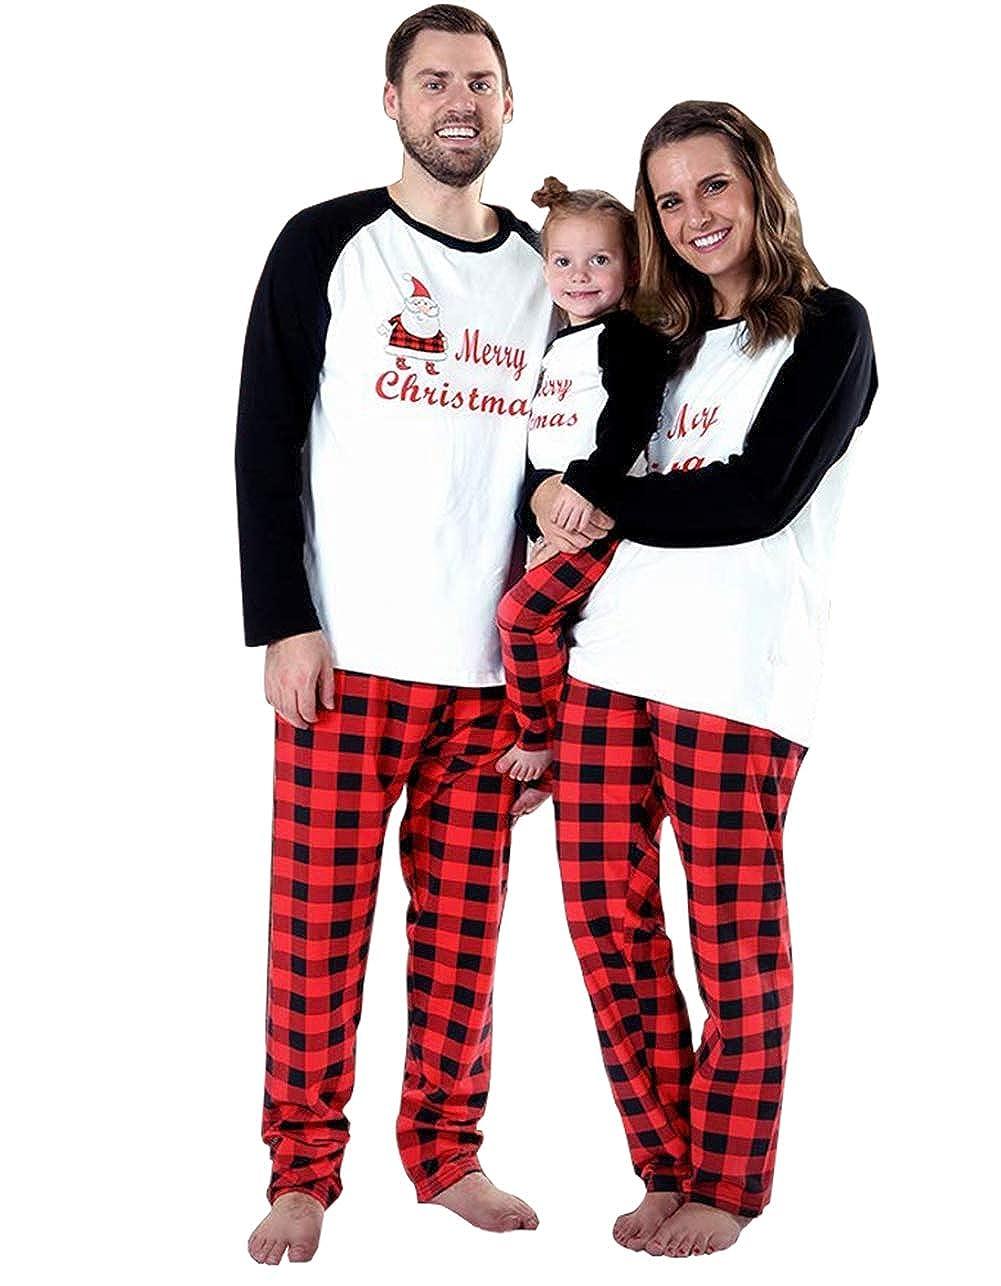 SWNONE Family Matching 2 PCS Santa Claus Print Christmas Pajamas Sets, Merry Christmas Classic Plaid Xmas Pajama Set